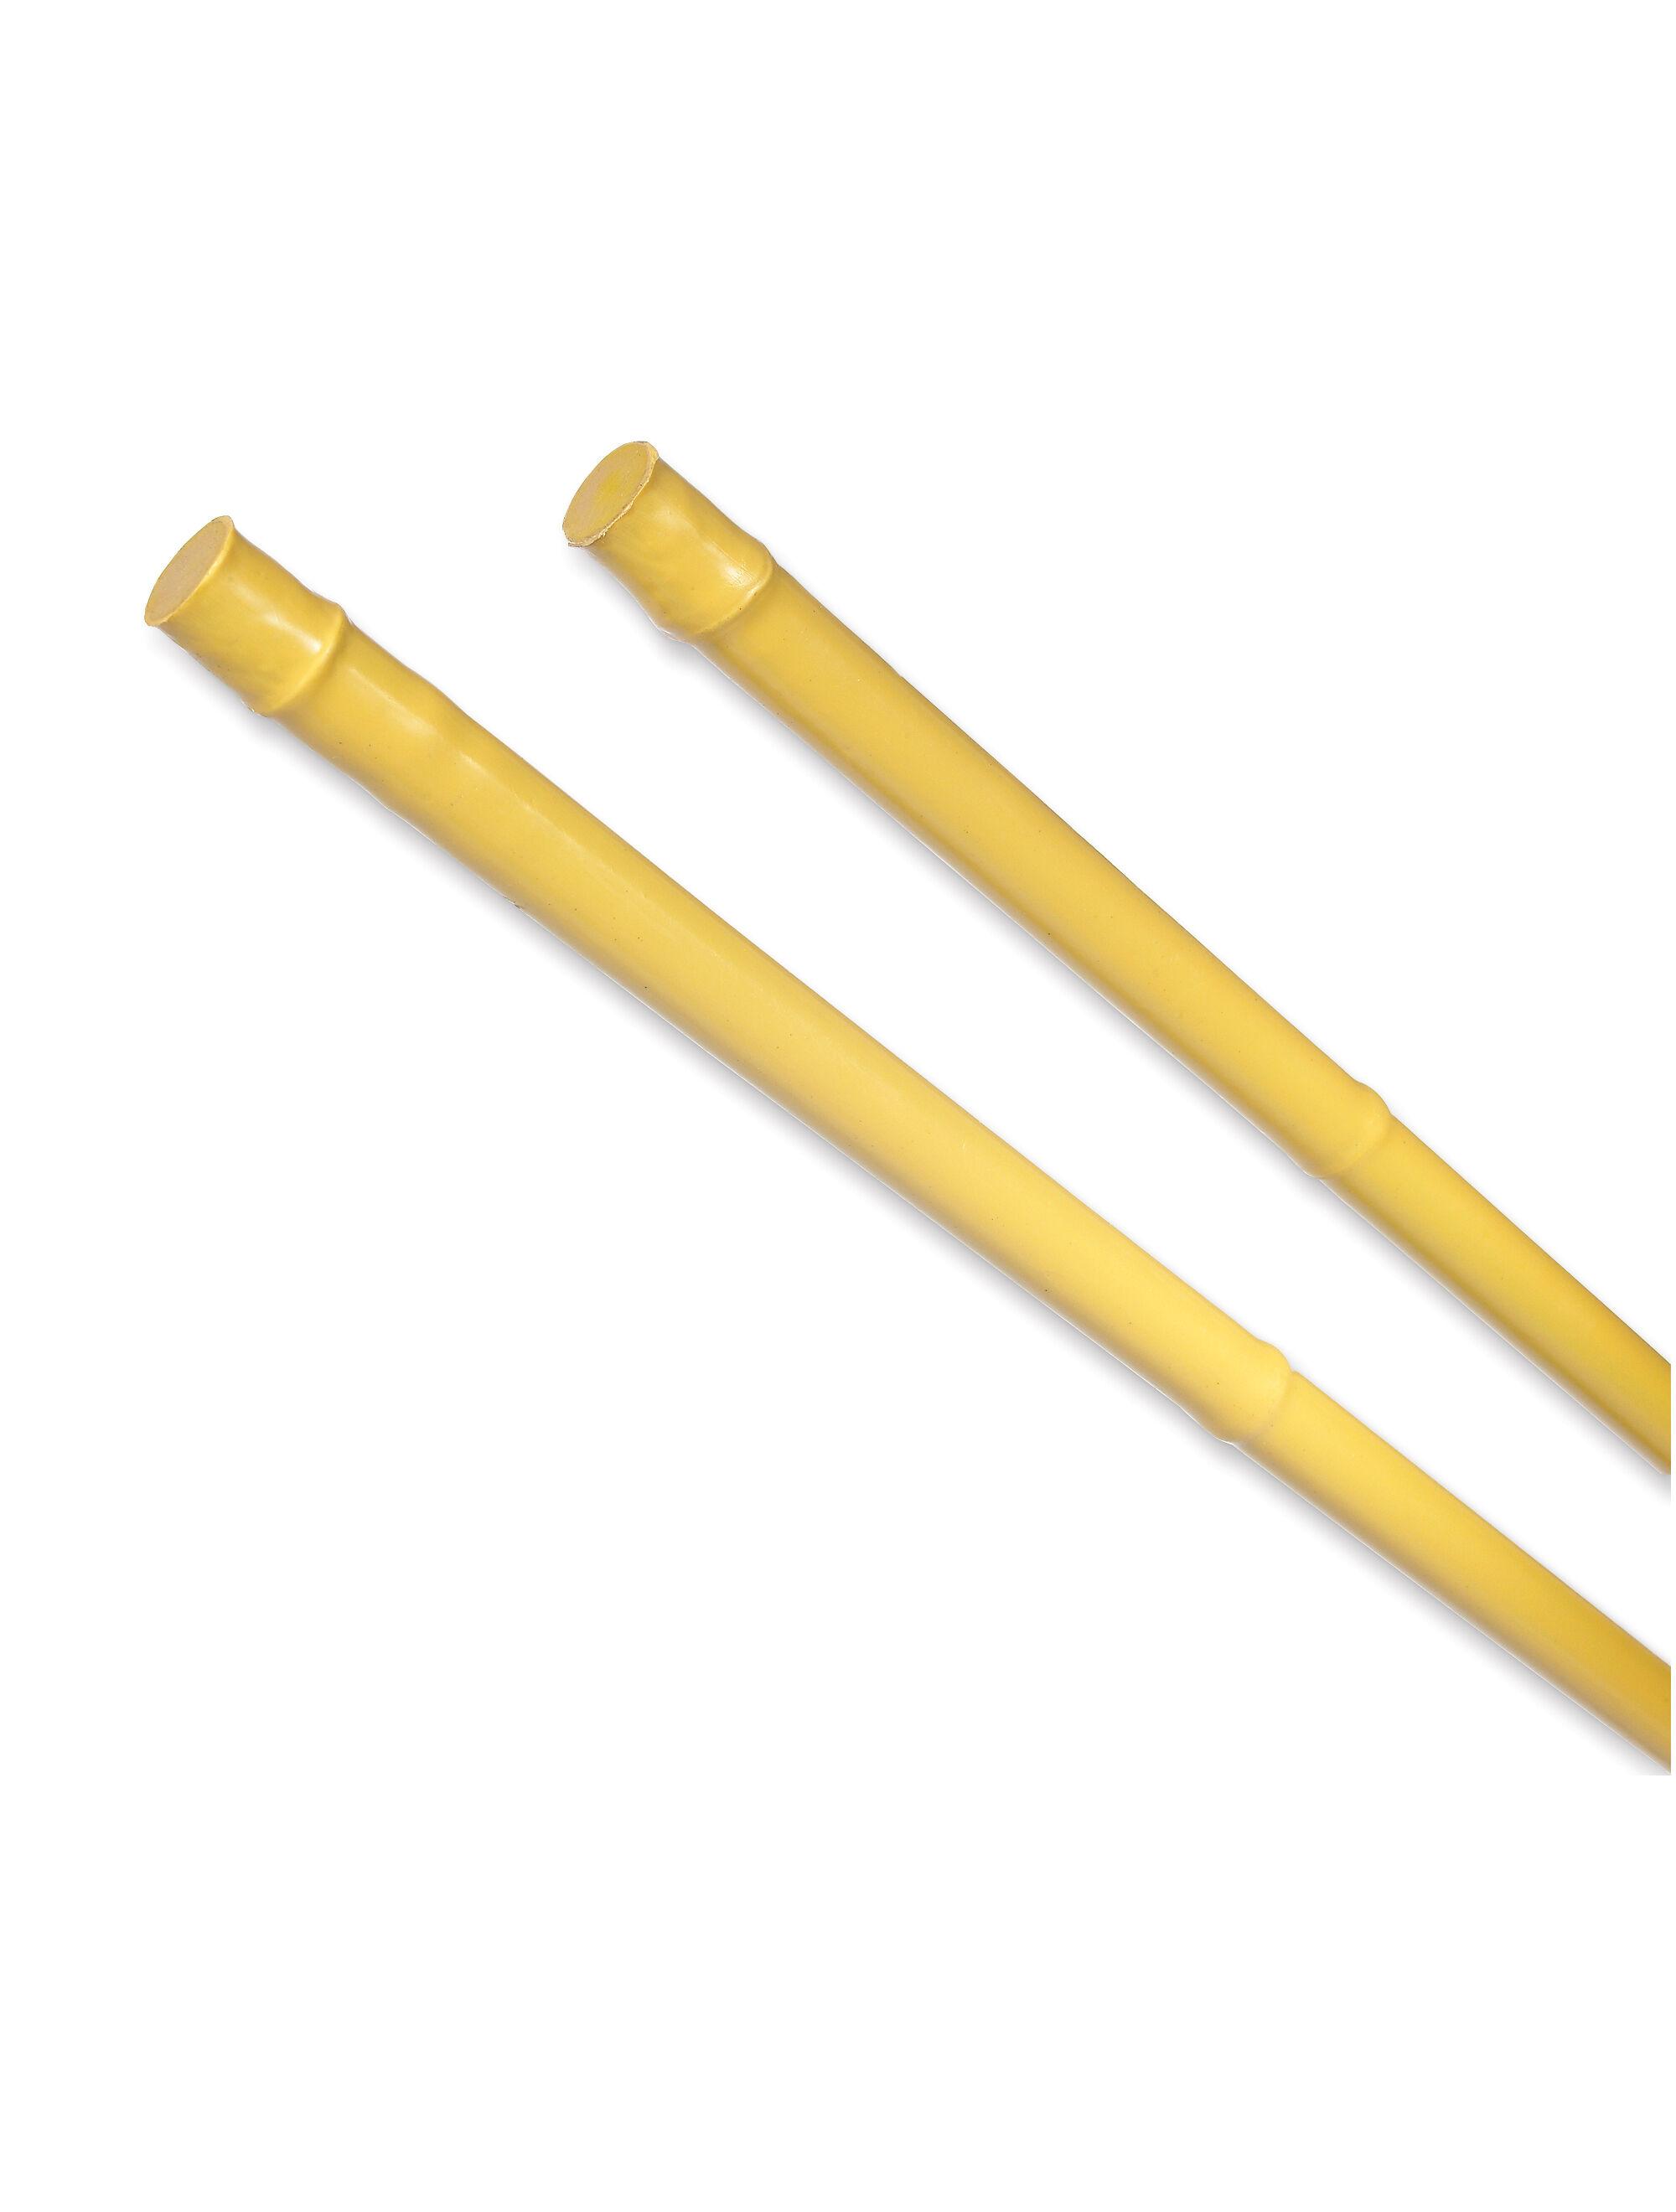 Bamboo poles stakes sticks gardeners